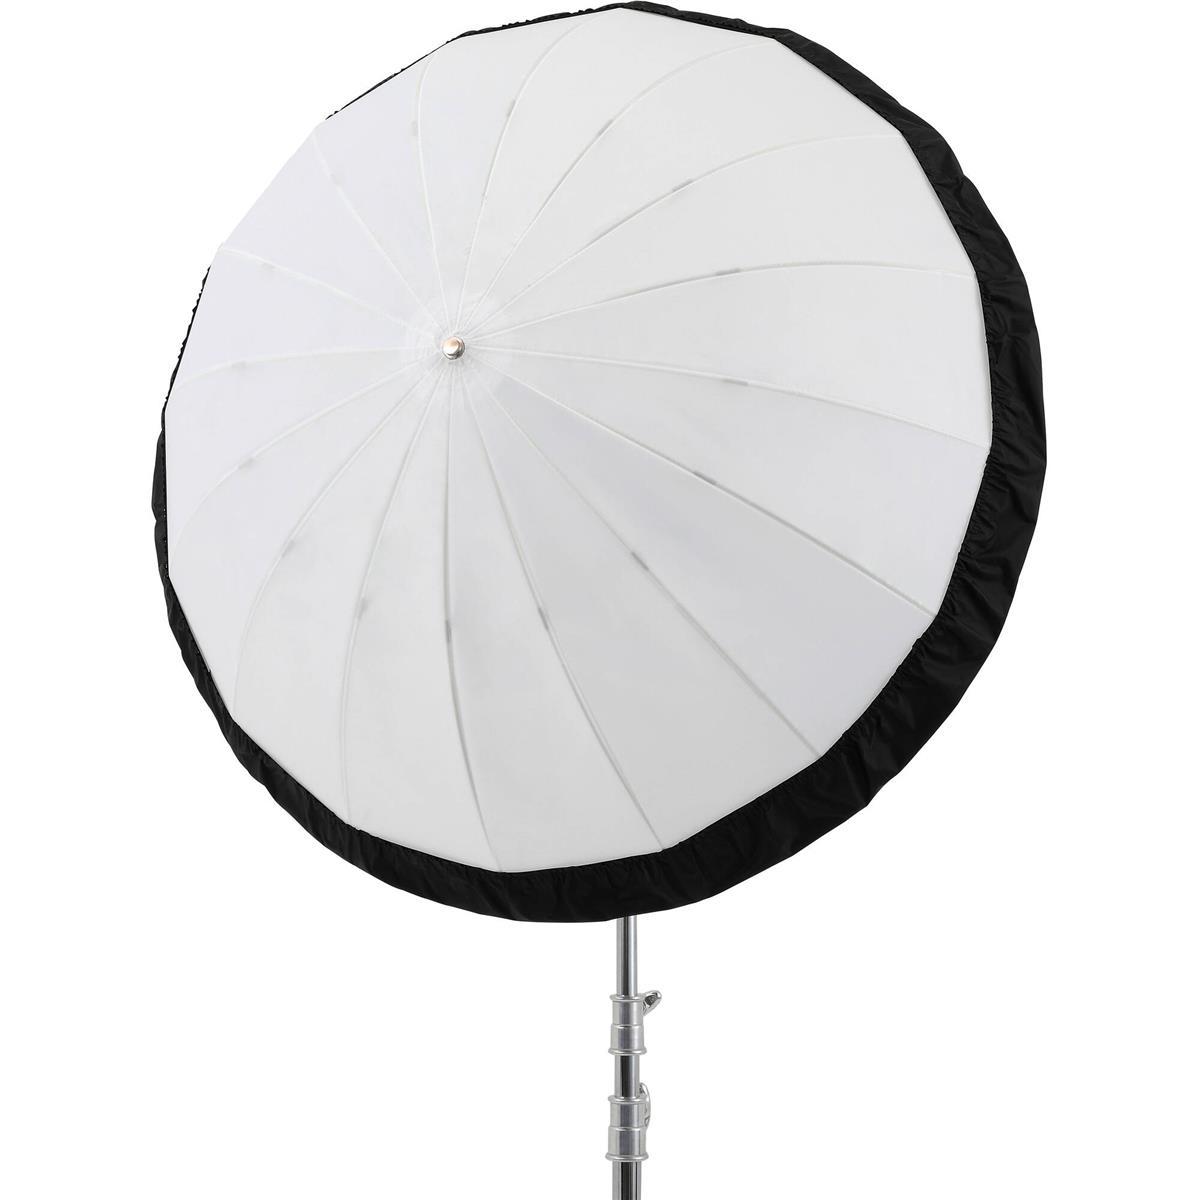 Godox 130 cm Schwarz / Silber Diffusor für Parabolschirm UB-130D